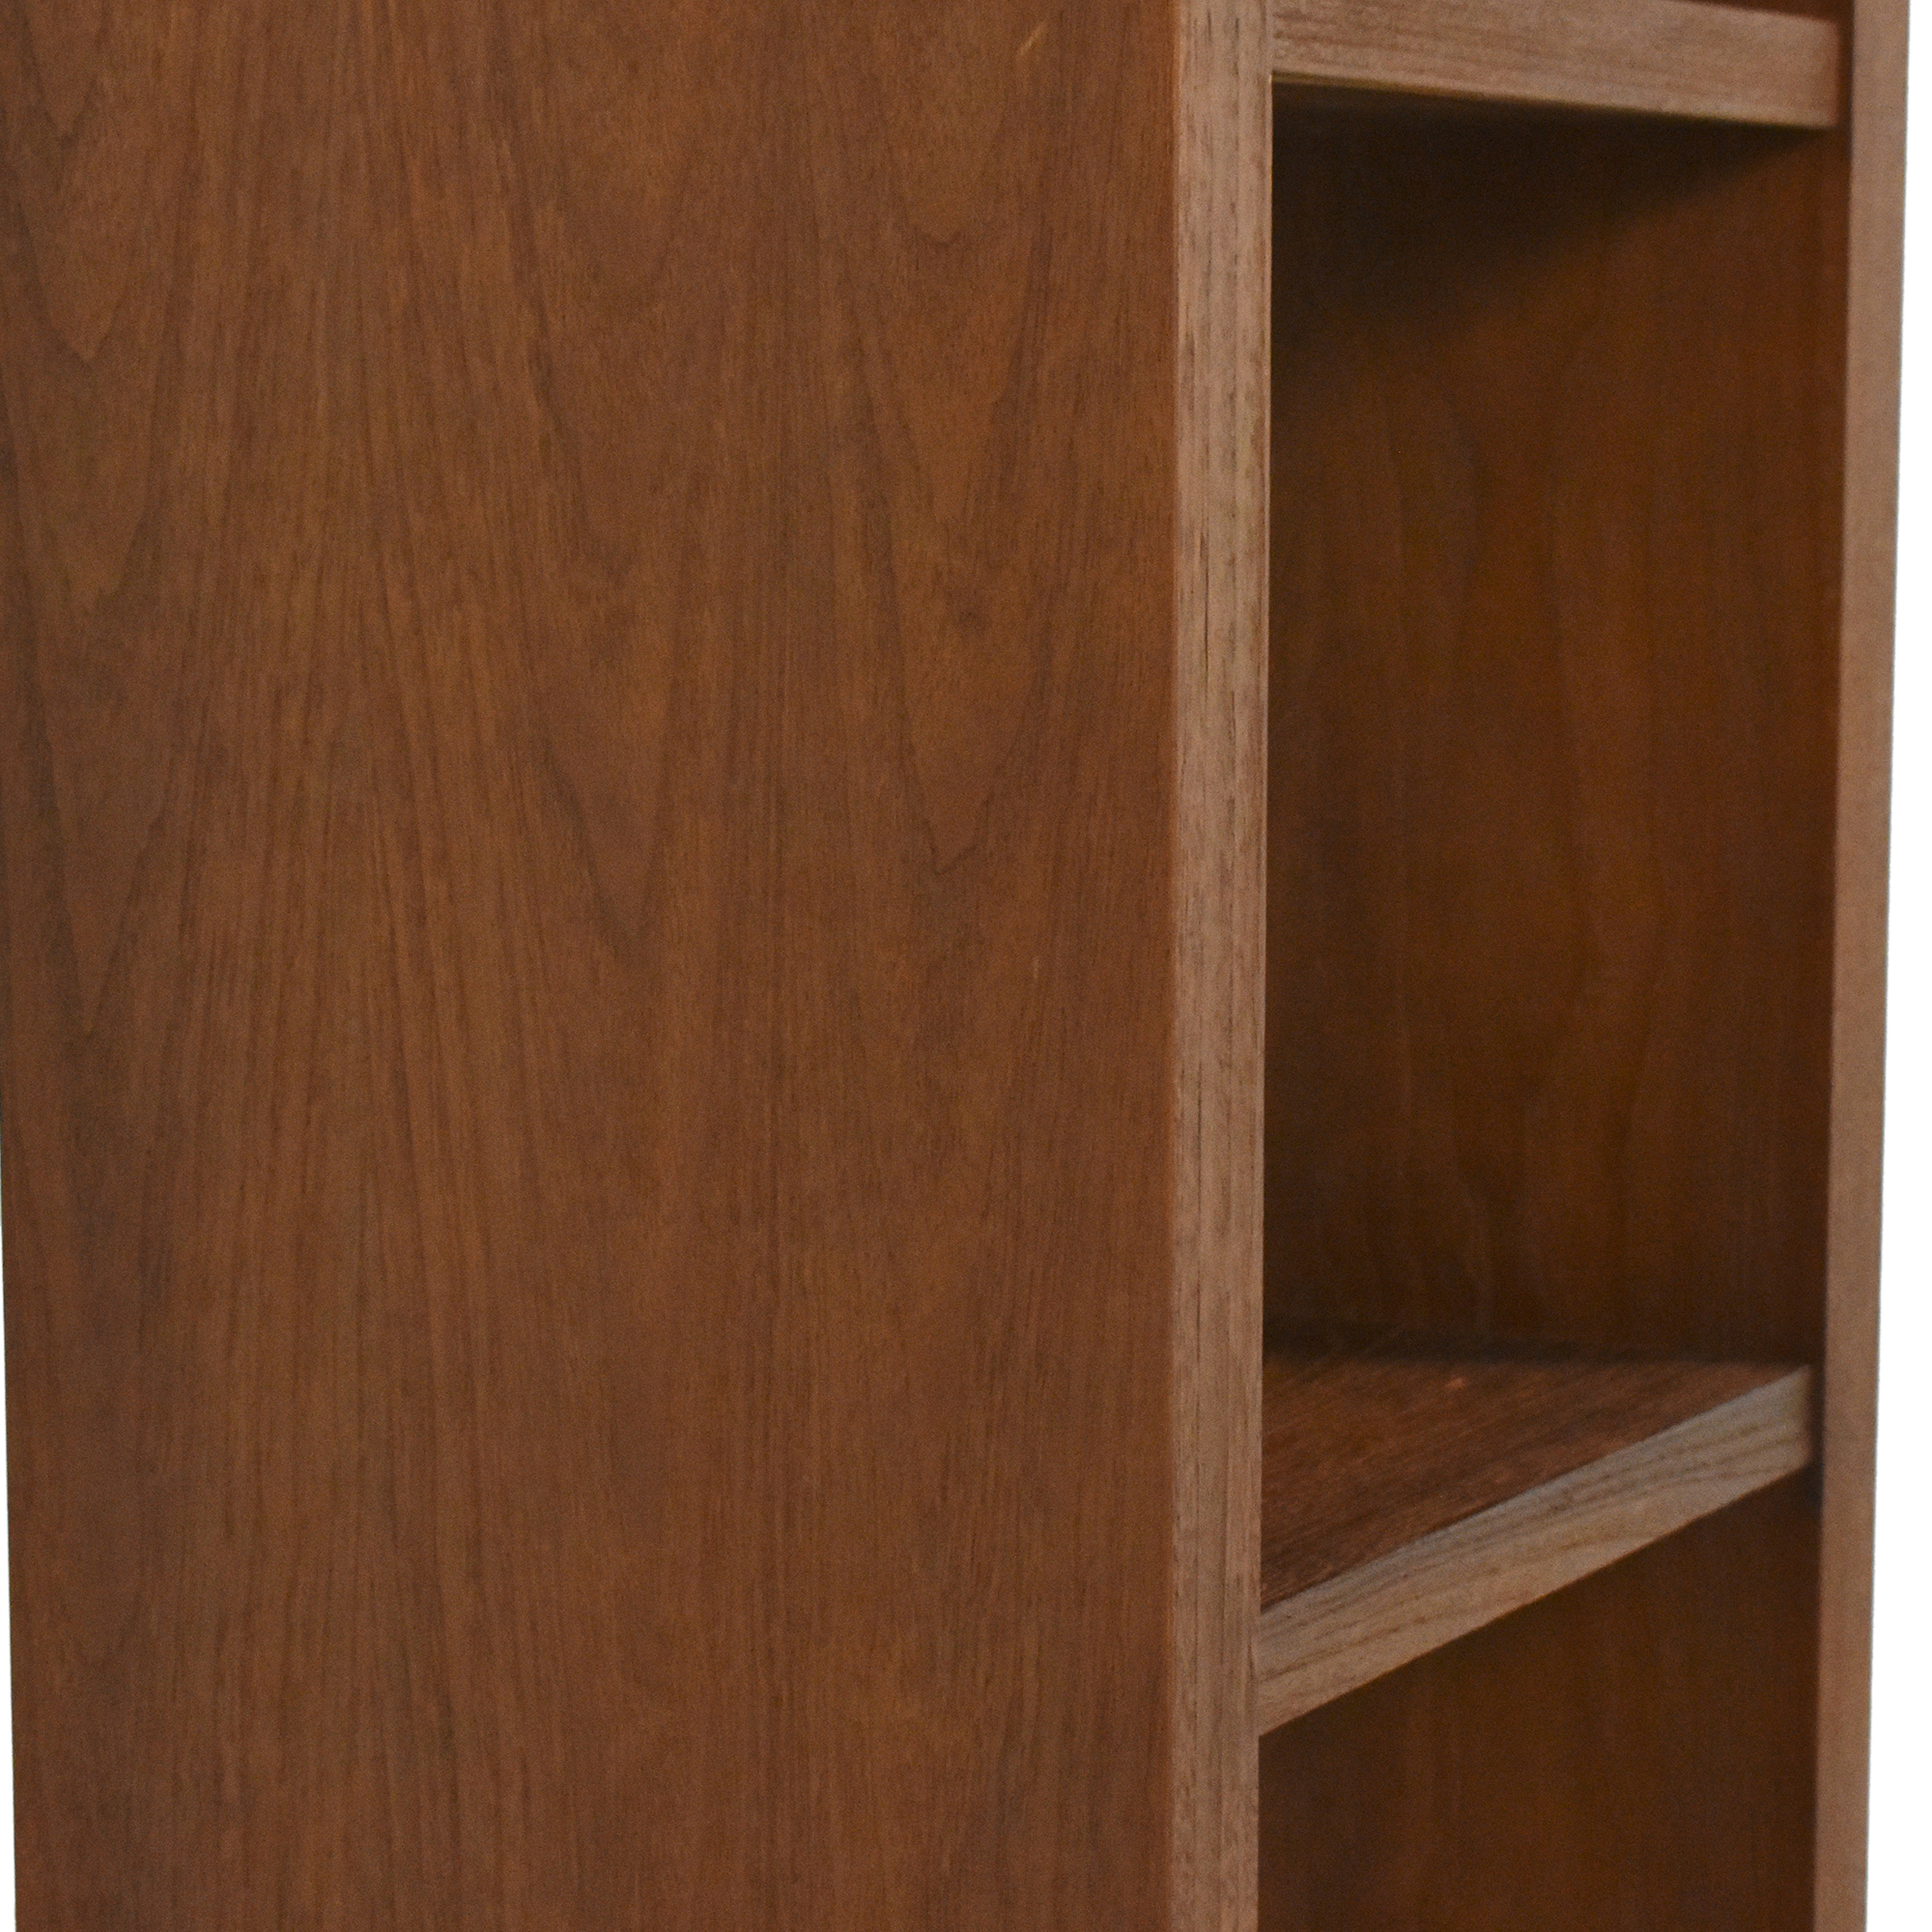 Mitchell Gold + Bob Williams Mitchell Gold + Bob Williams Narrow Bookshelf with Drawer  dimensions